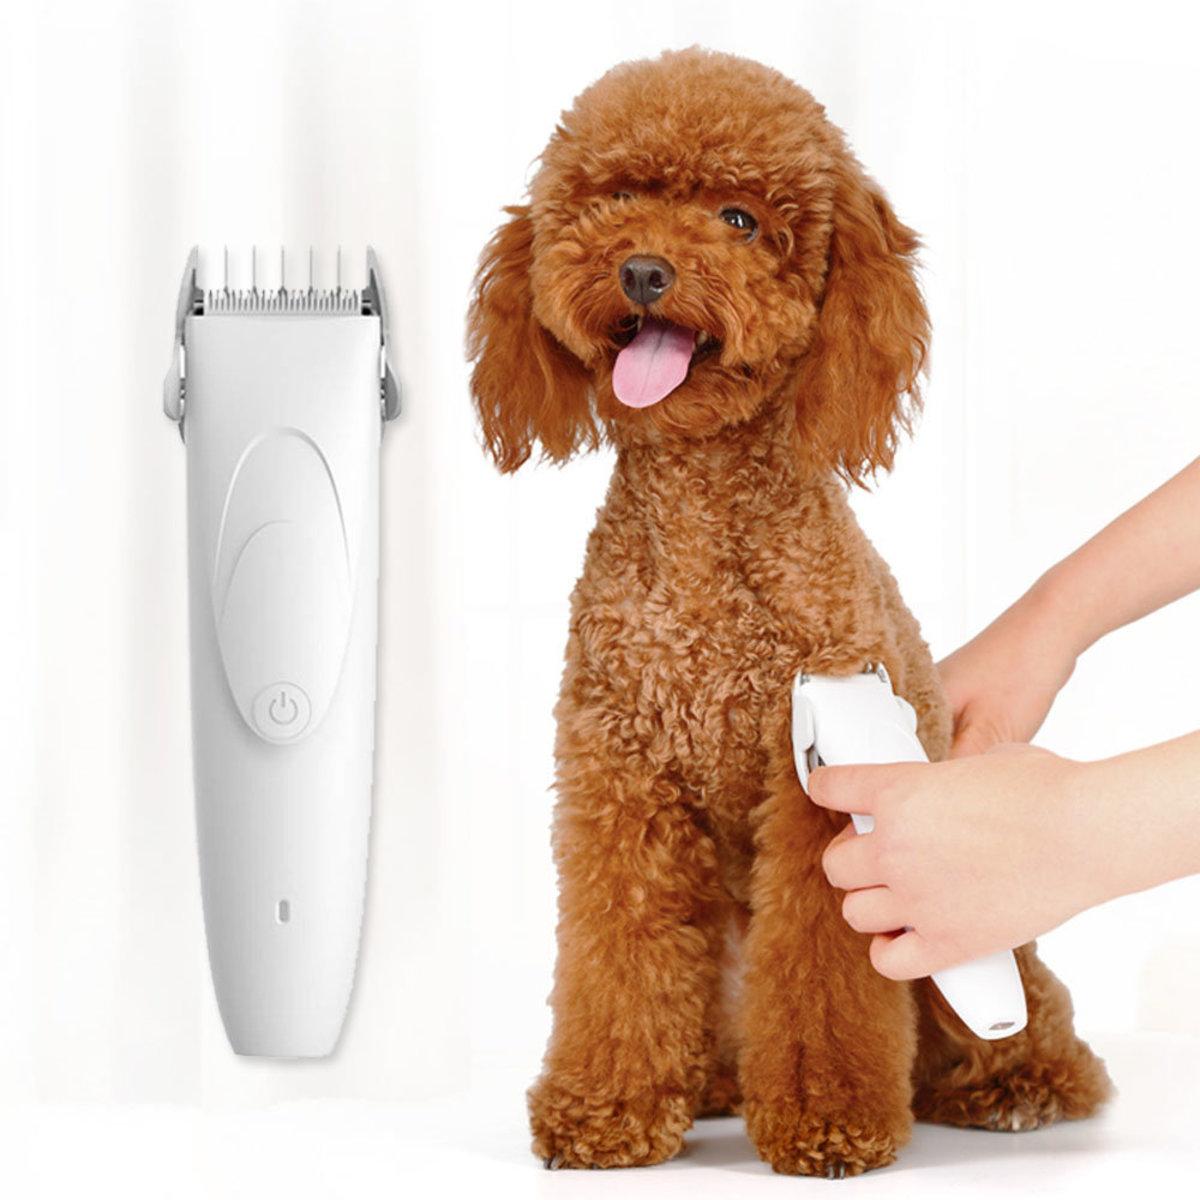 Pawbby pet shaver - MG-HC001